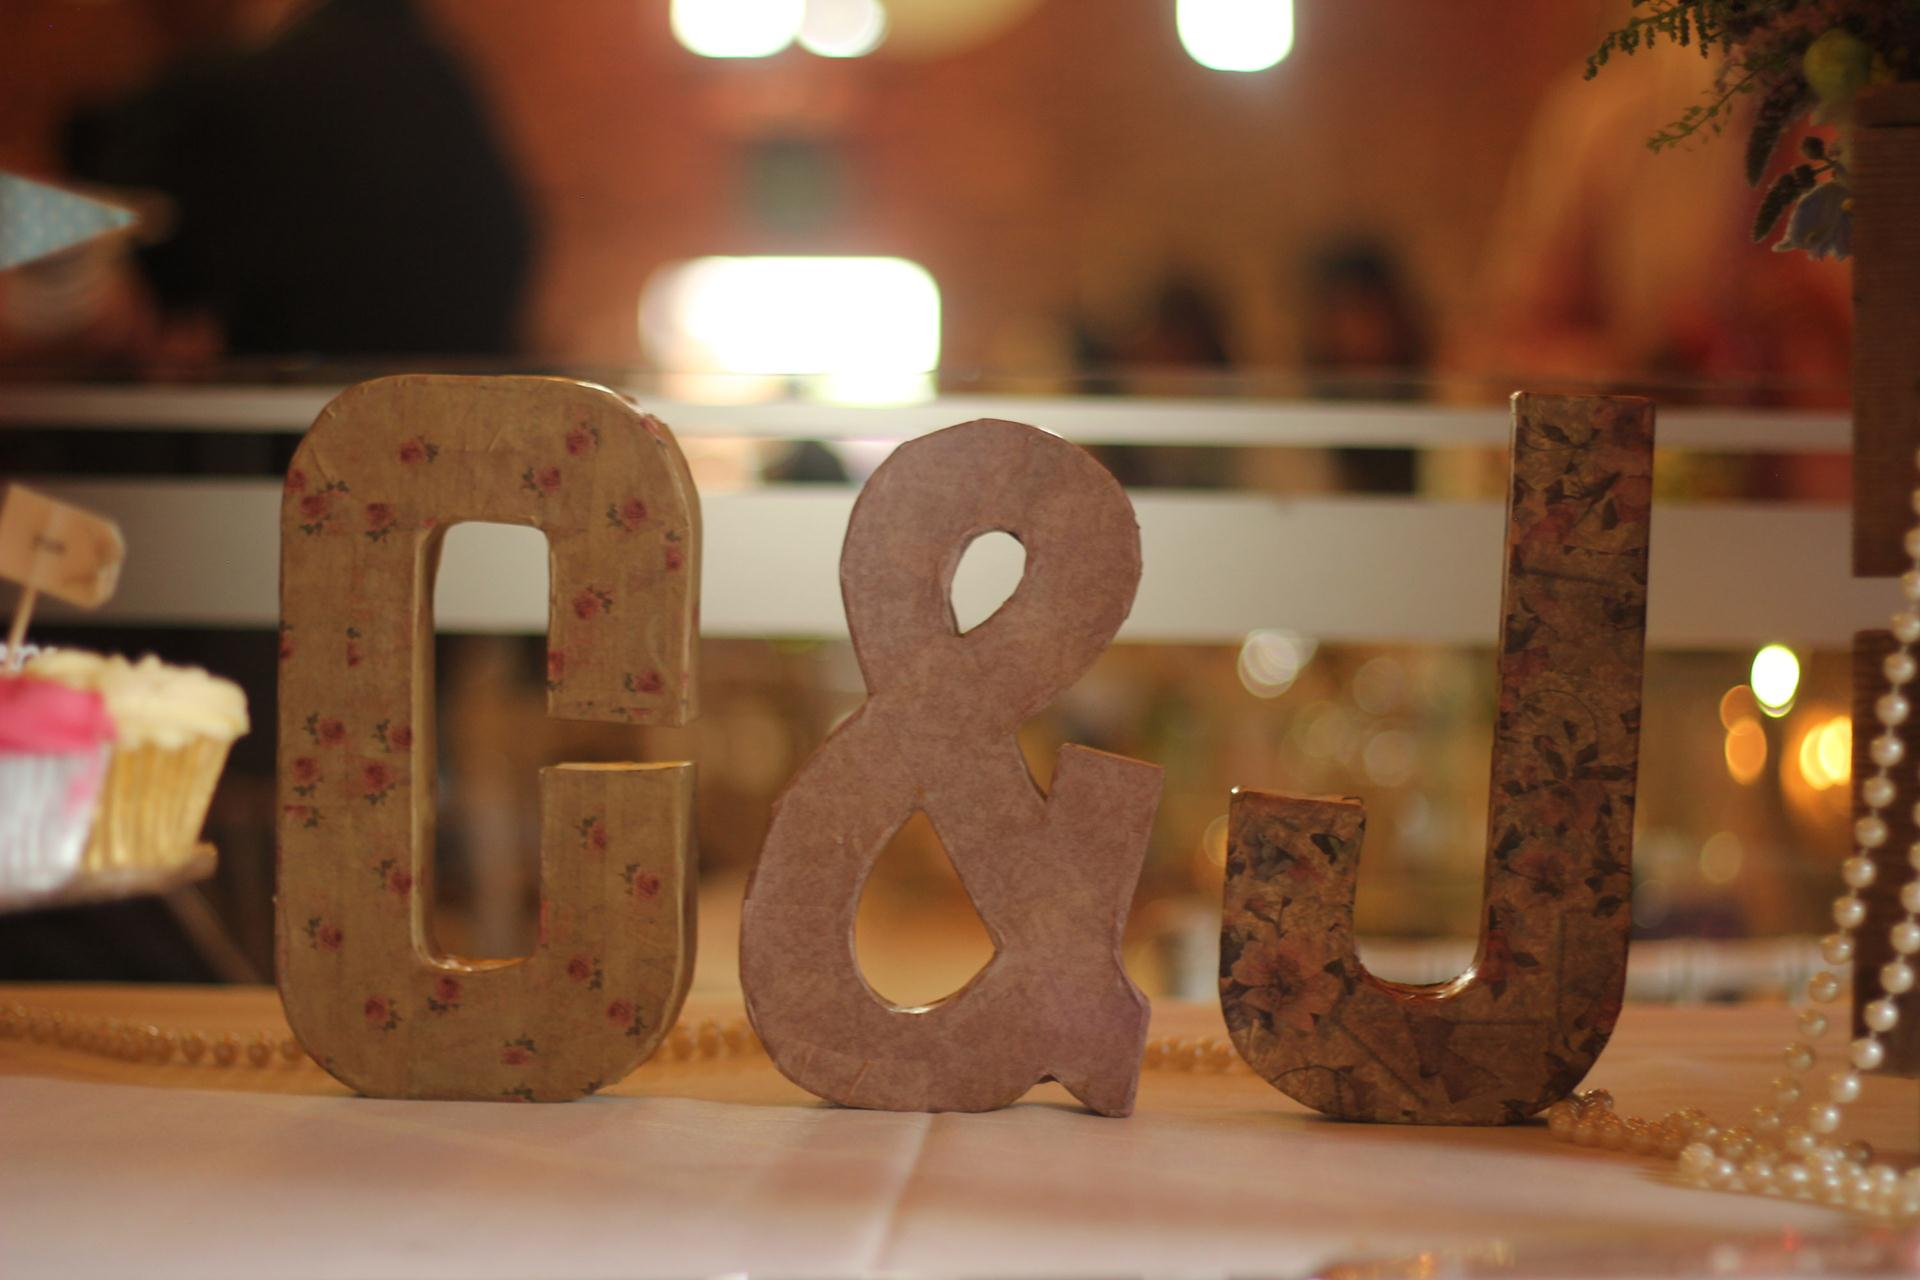 C & J letter symbols